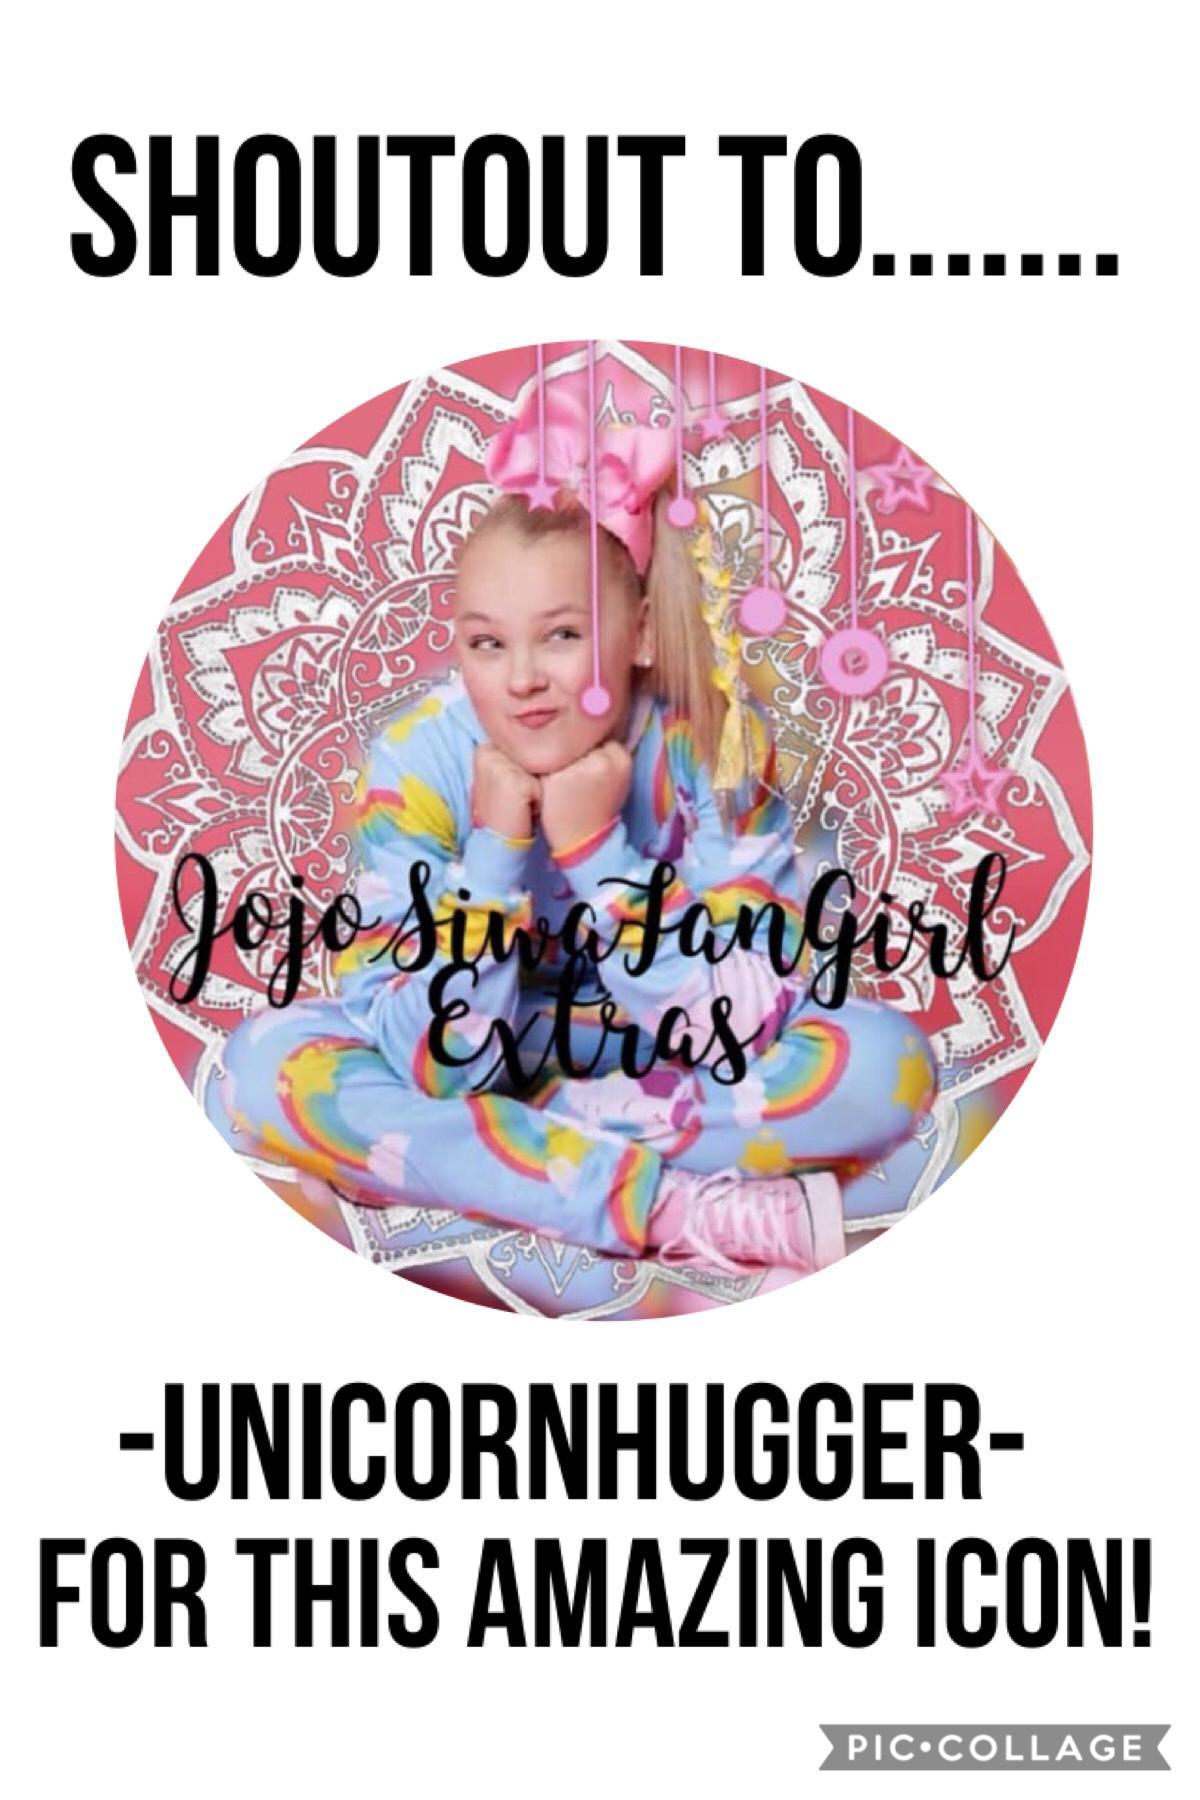 Tap❤️  Shoutout To the amazing-unicornhugger- for this amazing icon go follow her🧡 QOTD: 🍕or 🍟 AOTD: 🍕